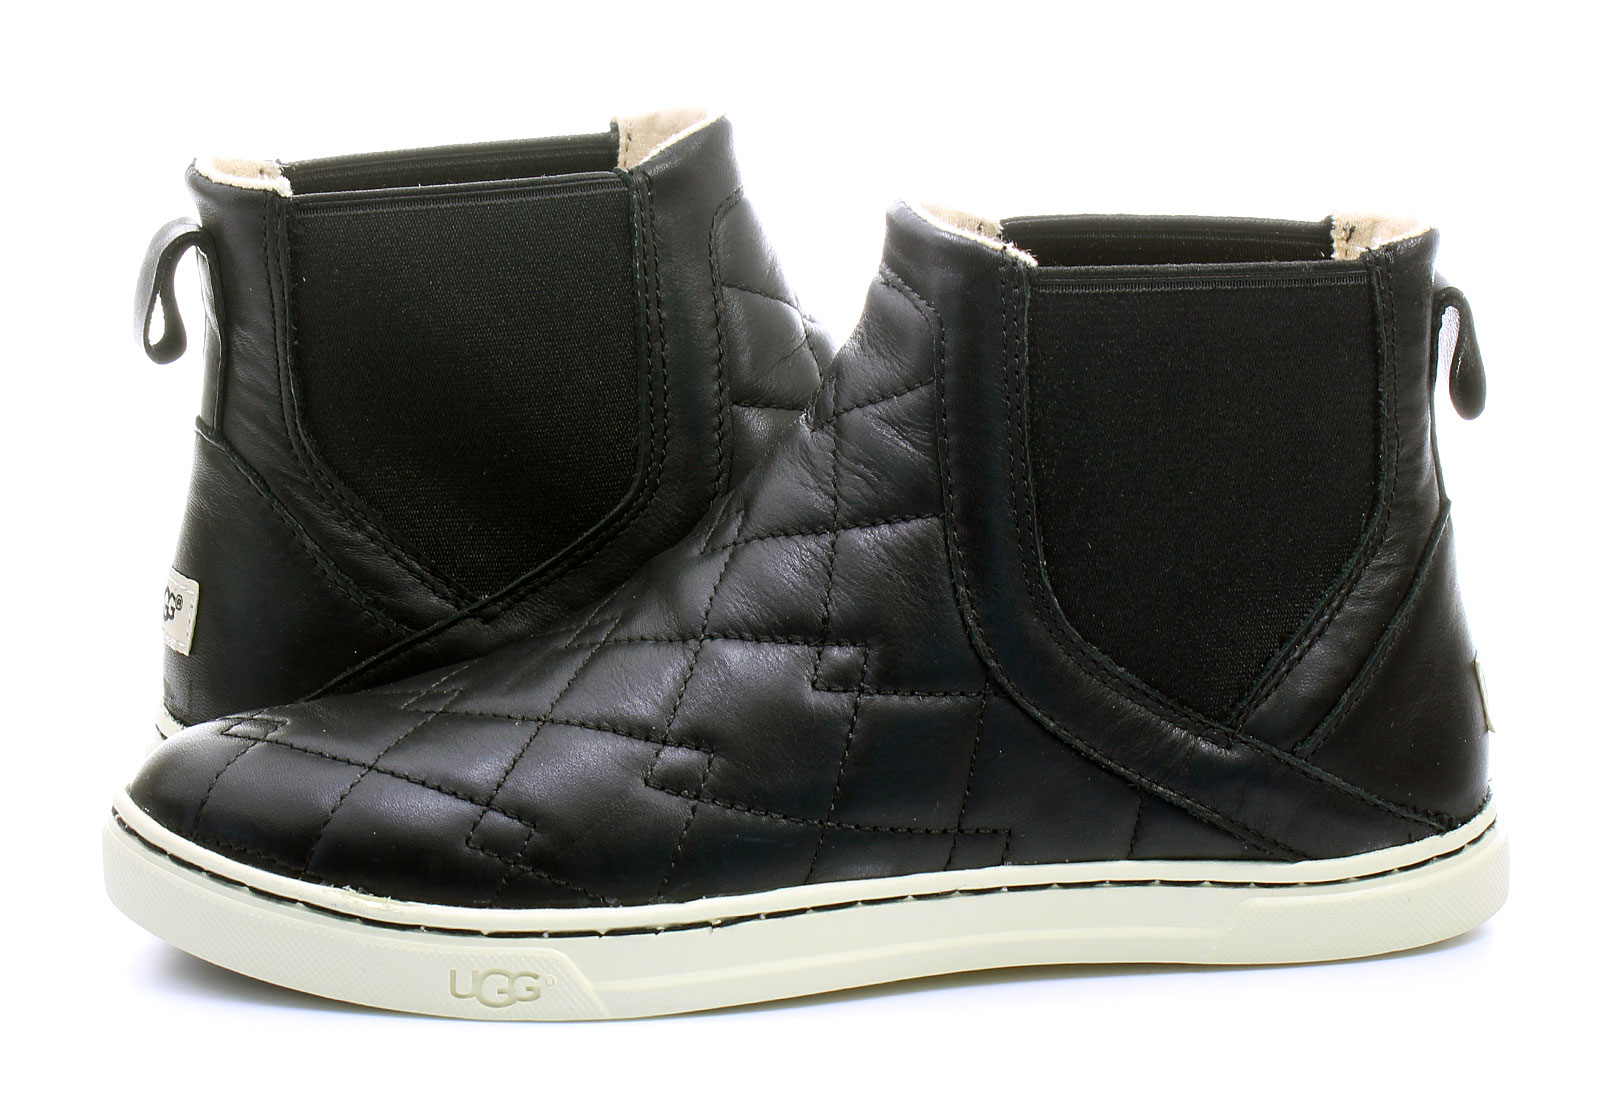 Ugg Shoes - Hollyn Deco Quilt - 1014372-BLK - Online shop for ... 713c209d0d